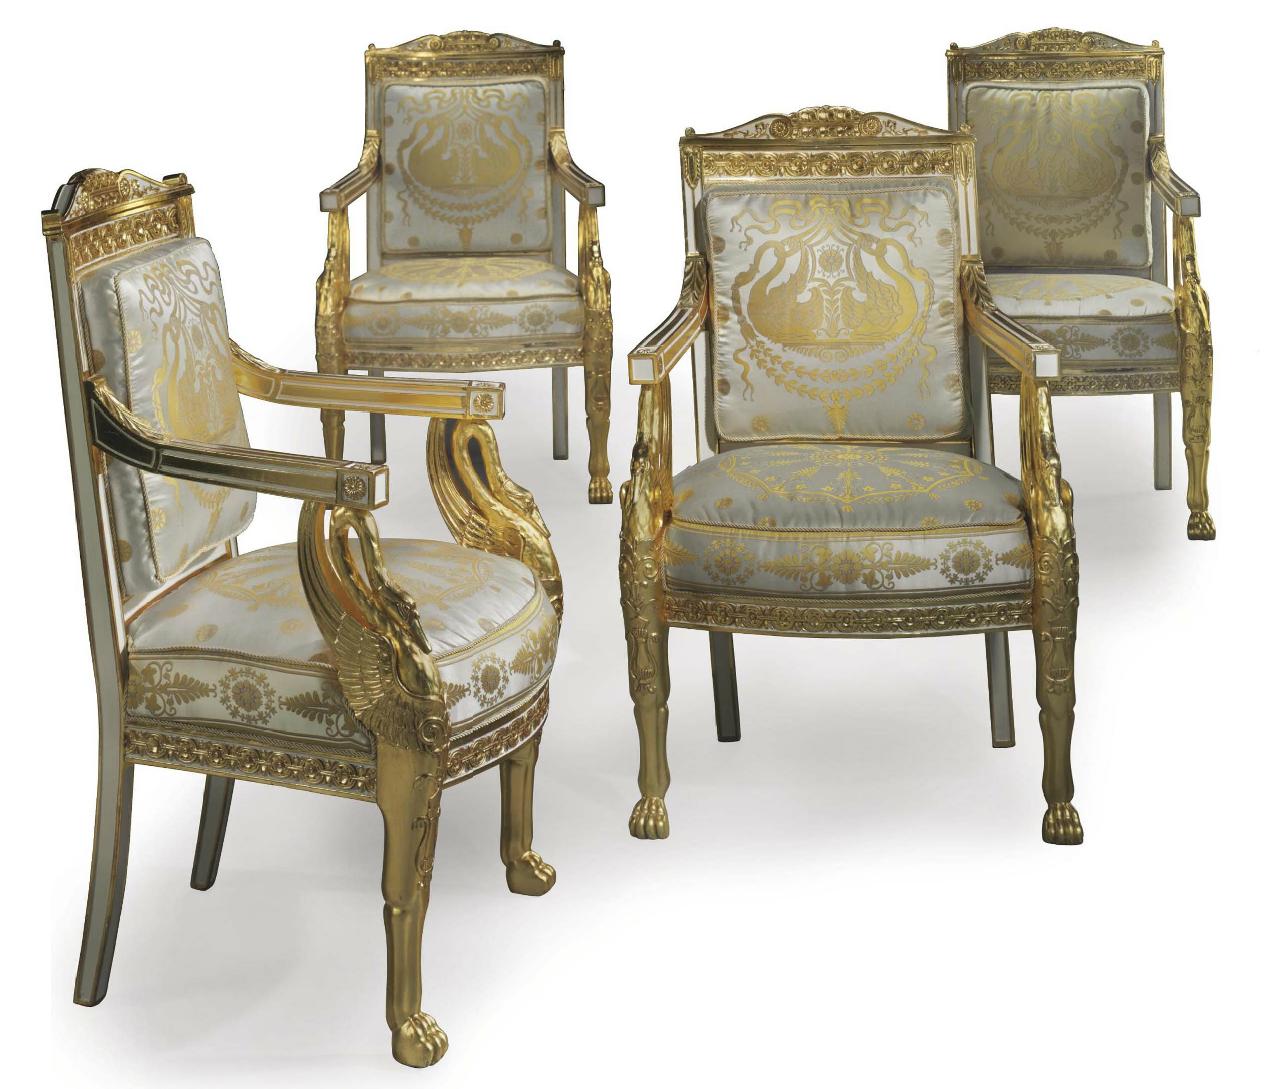 A Set Of Four Empire White Painted And Parcel Gilt Fauteuils Attributed To Henri Jacob Circa 1805 Each With Scrolle Fauteuil Mobilier De Salon Art Decoratif